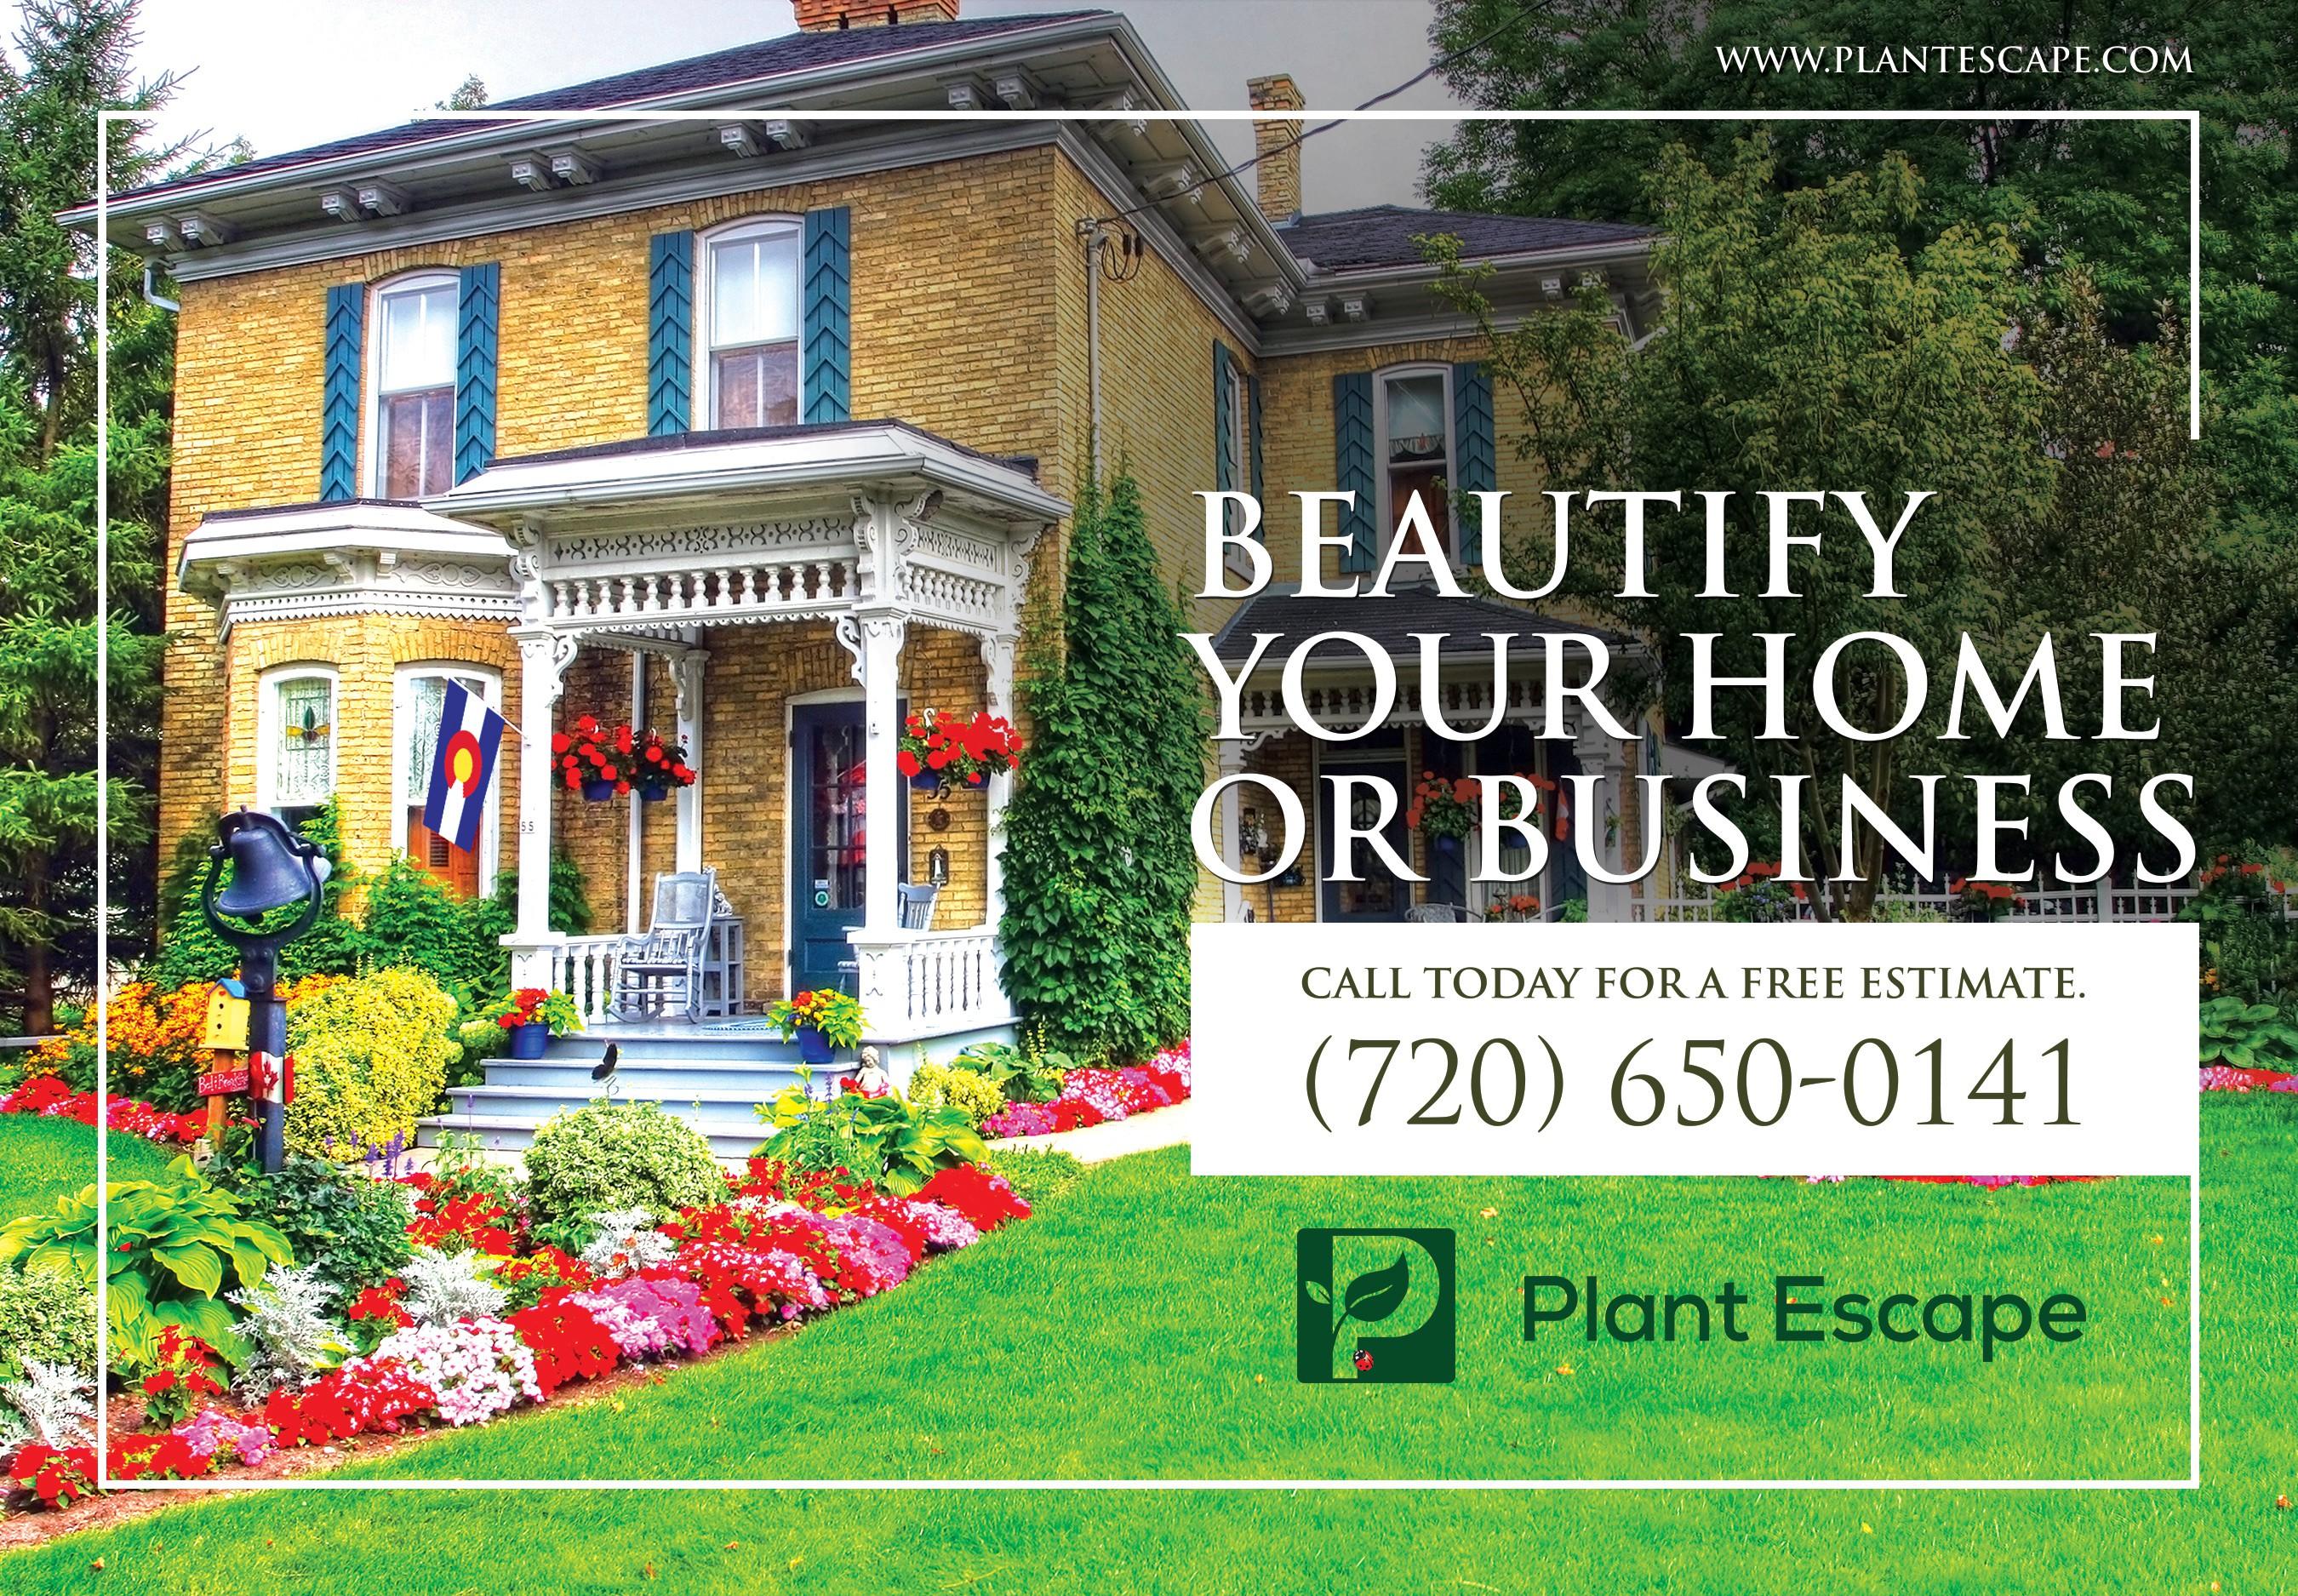 Magazine Ad for Gardening Company